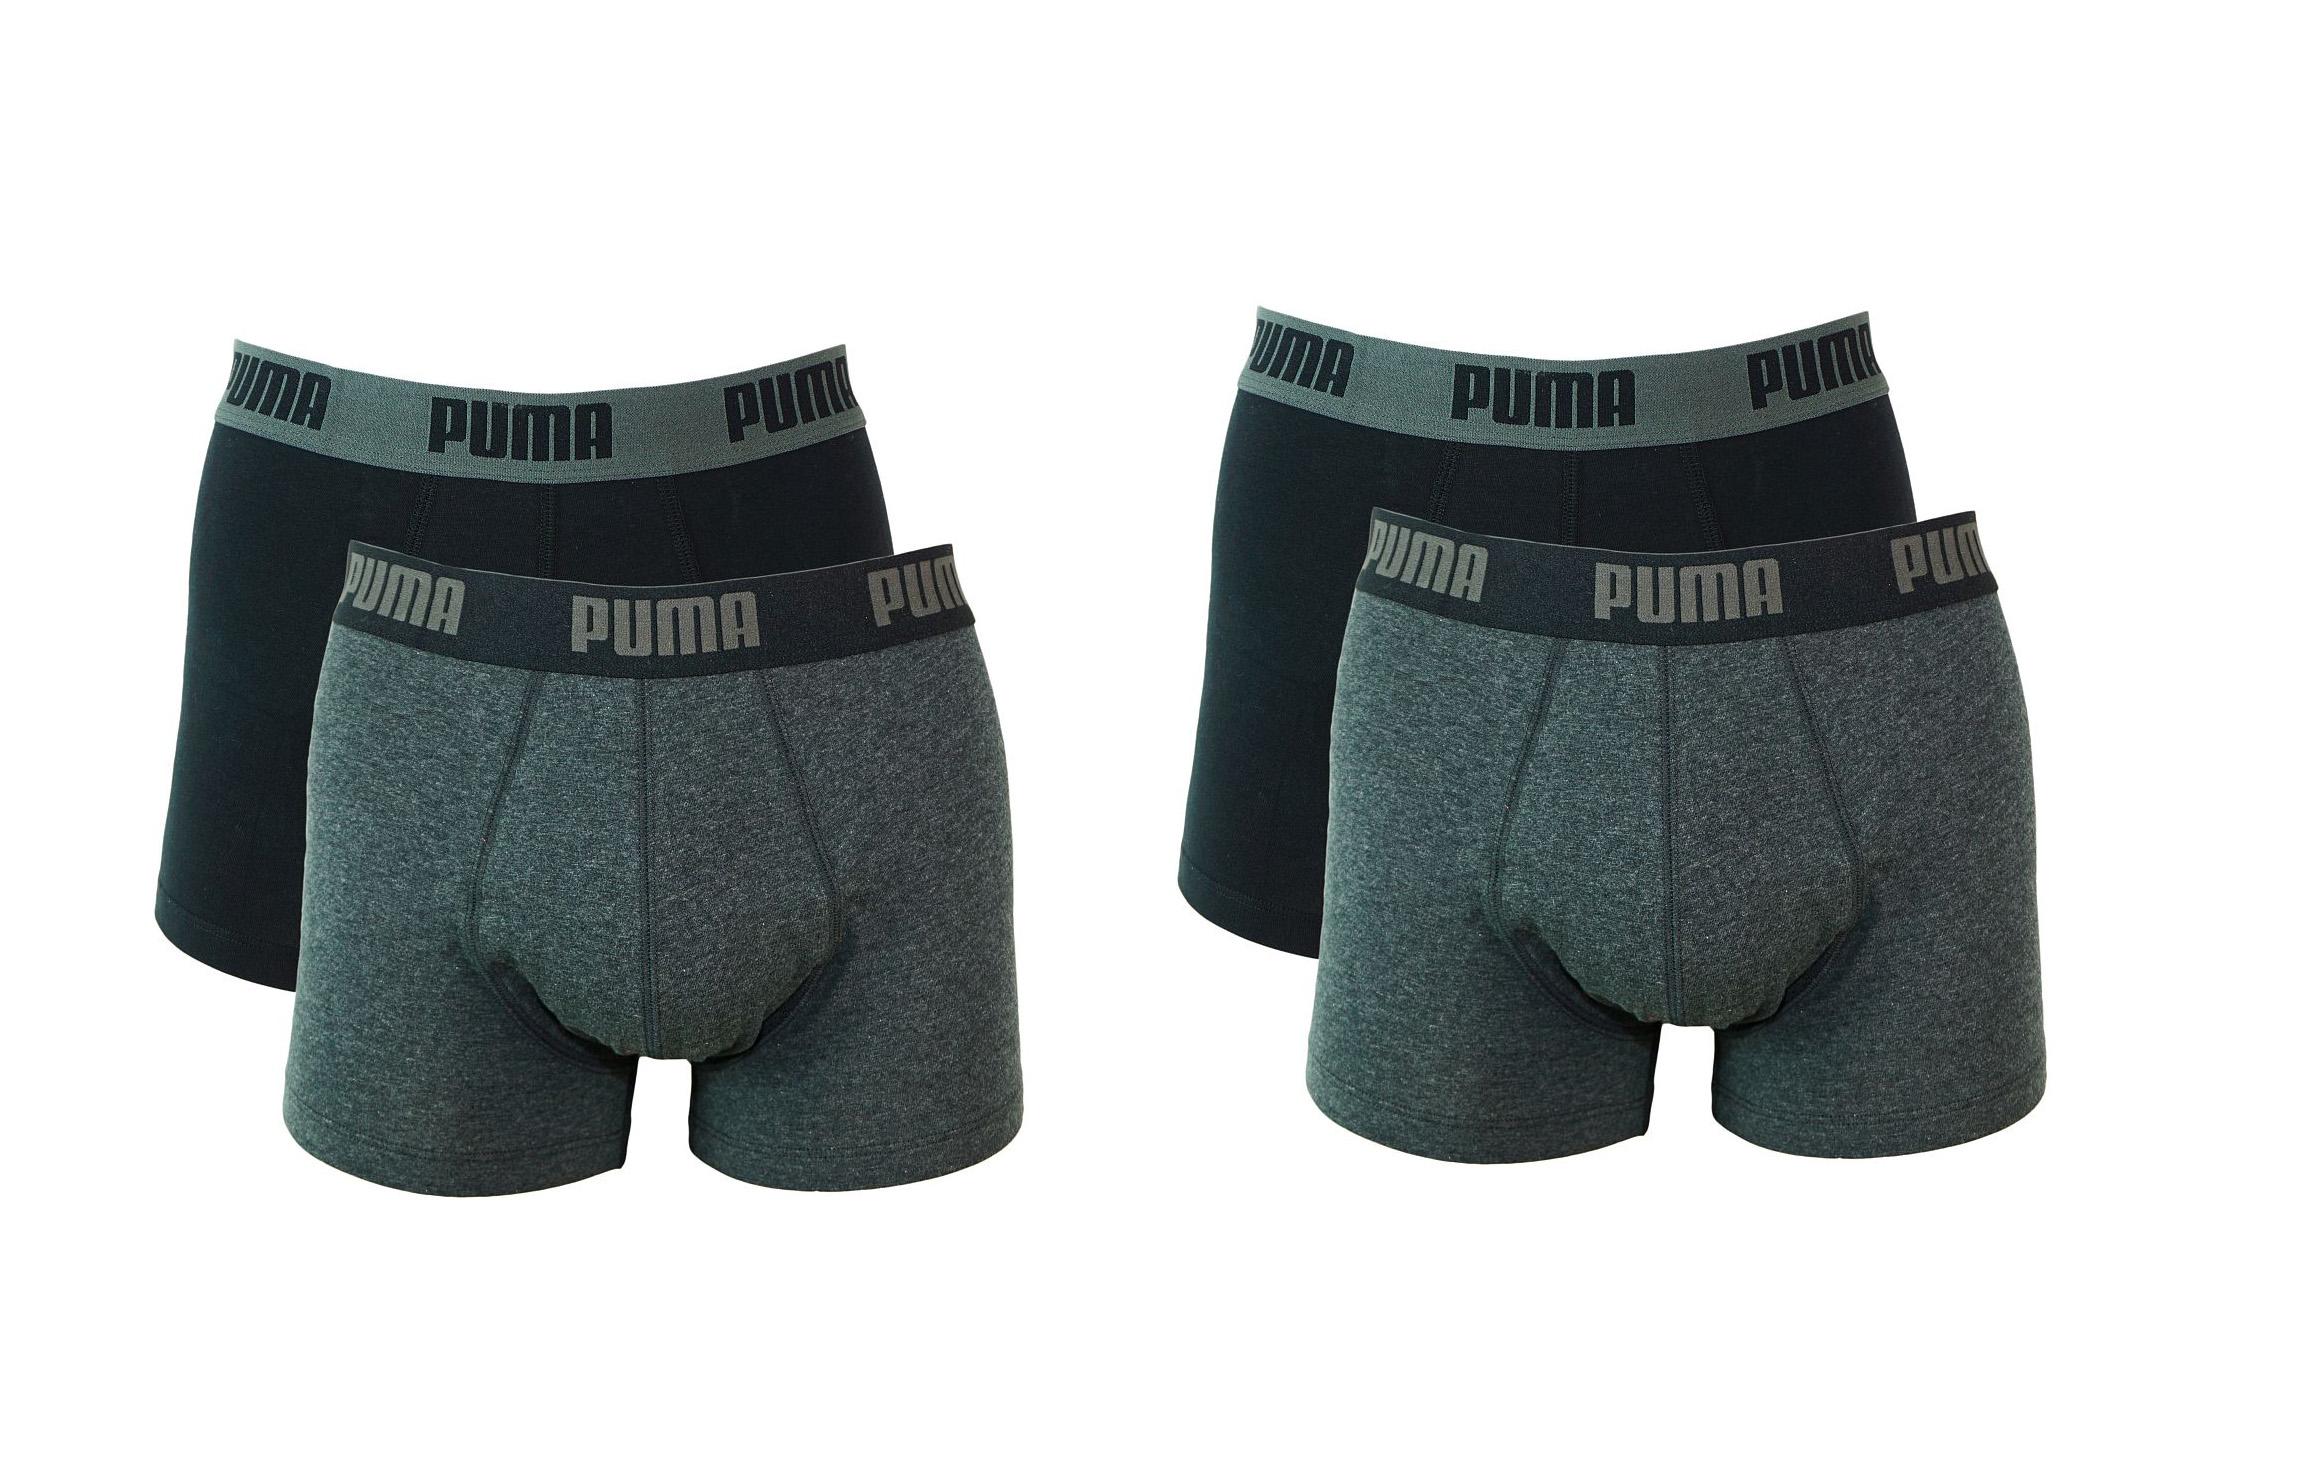 PUMA Shorts Unterhosen 2 x 2er Pack Trunk 521025001 691 020 dark grey melange, black SF17-PMS2